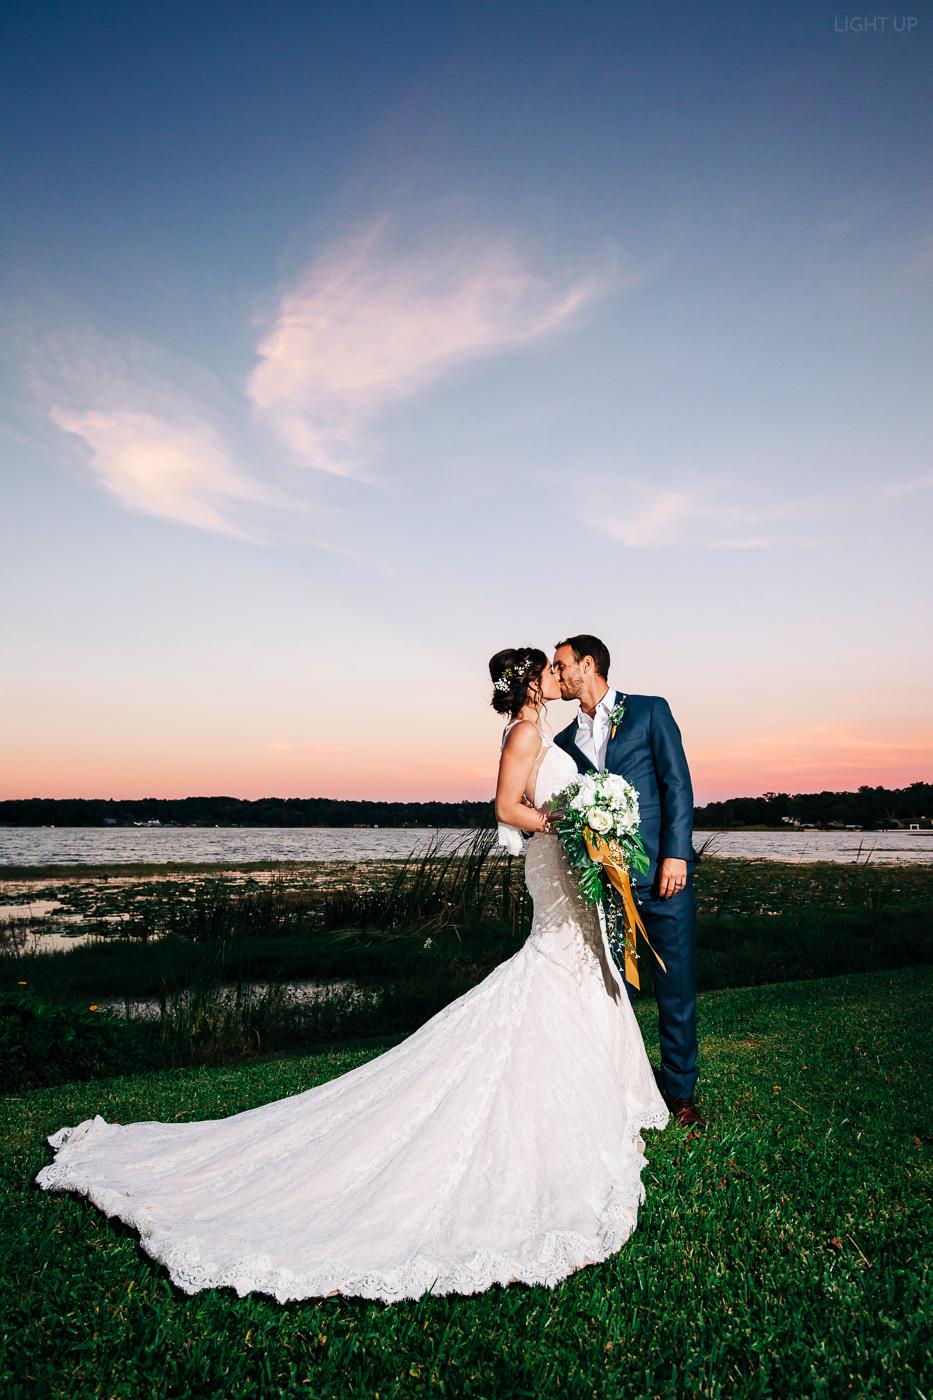 sunset wedding photo in mount dora